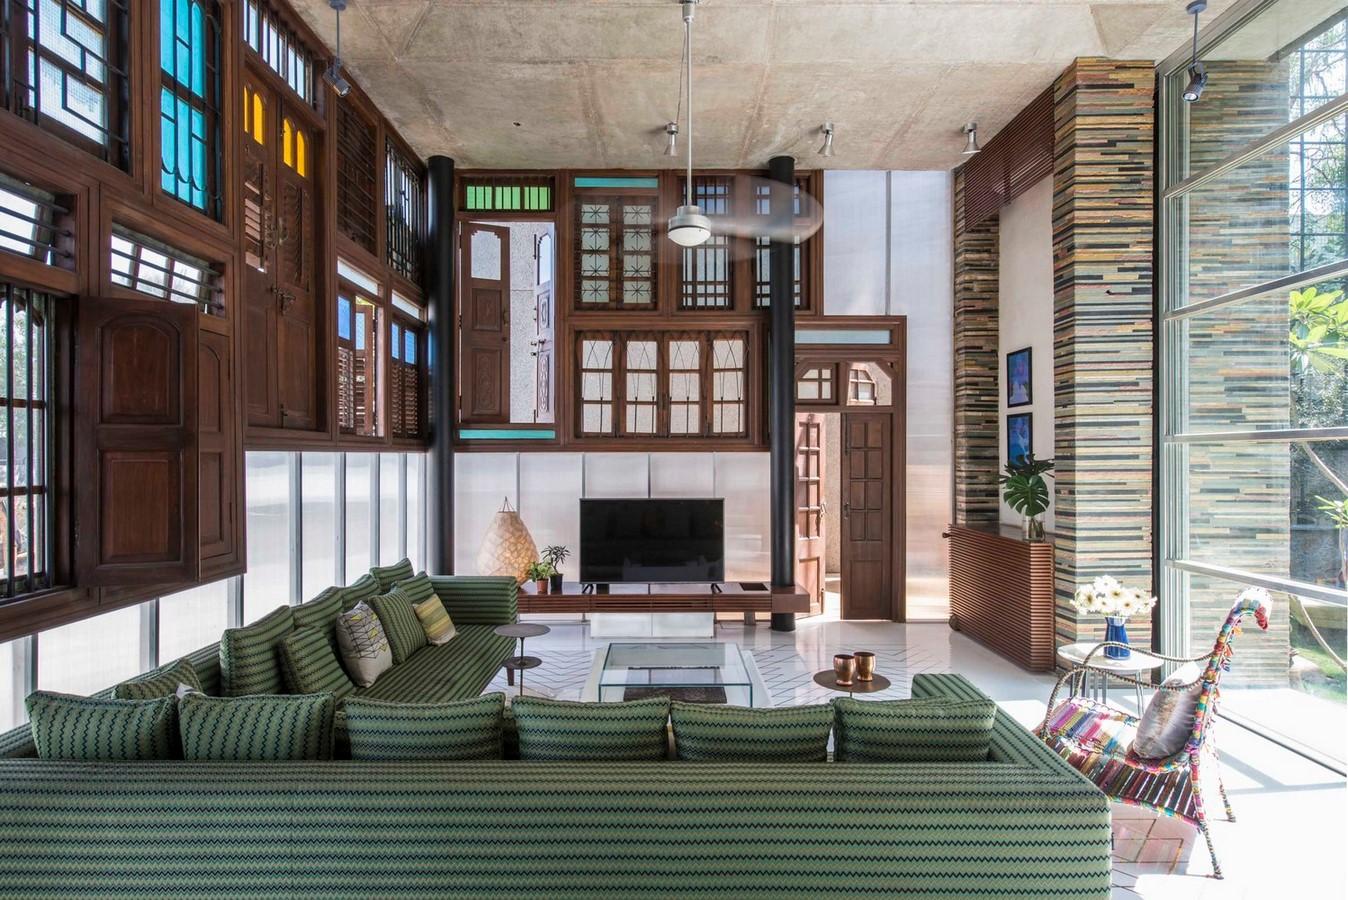 10 Building Materials for Interiors- 2021 Sheet19